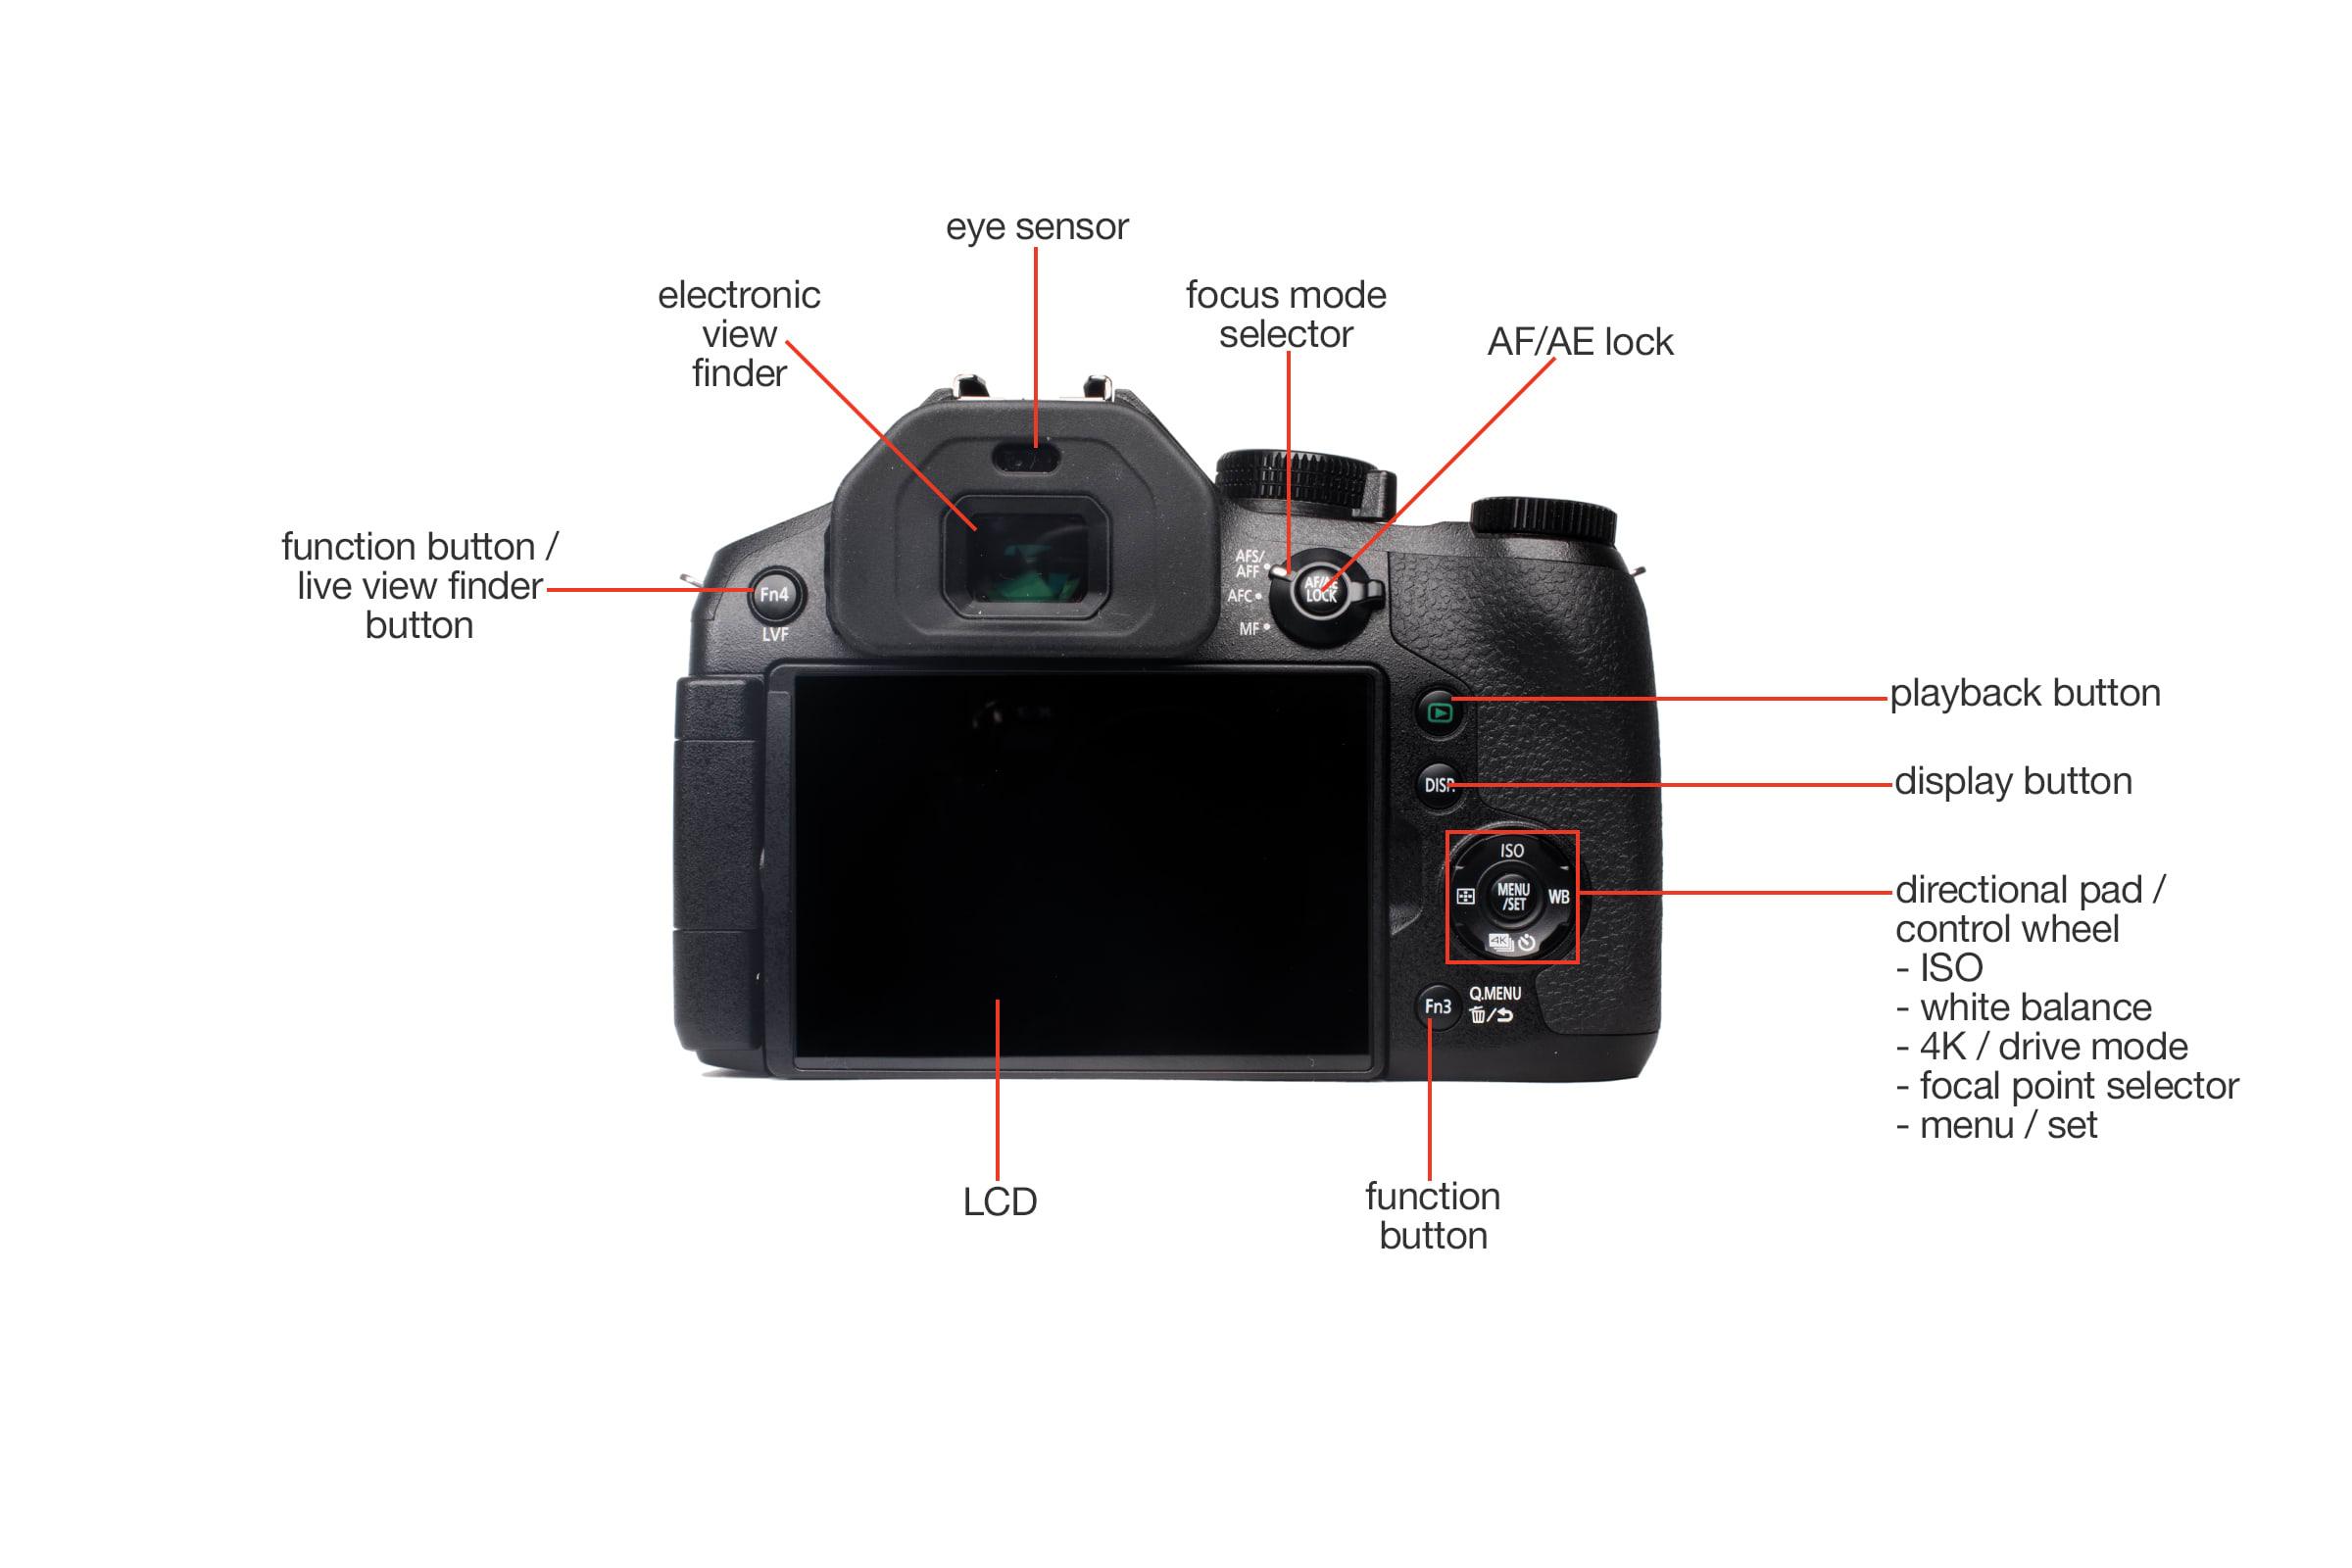 Rear view of the Panasonic Lumix DMC-FZ300.